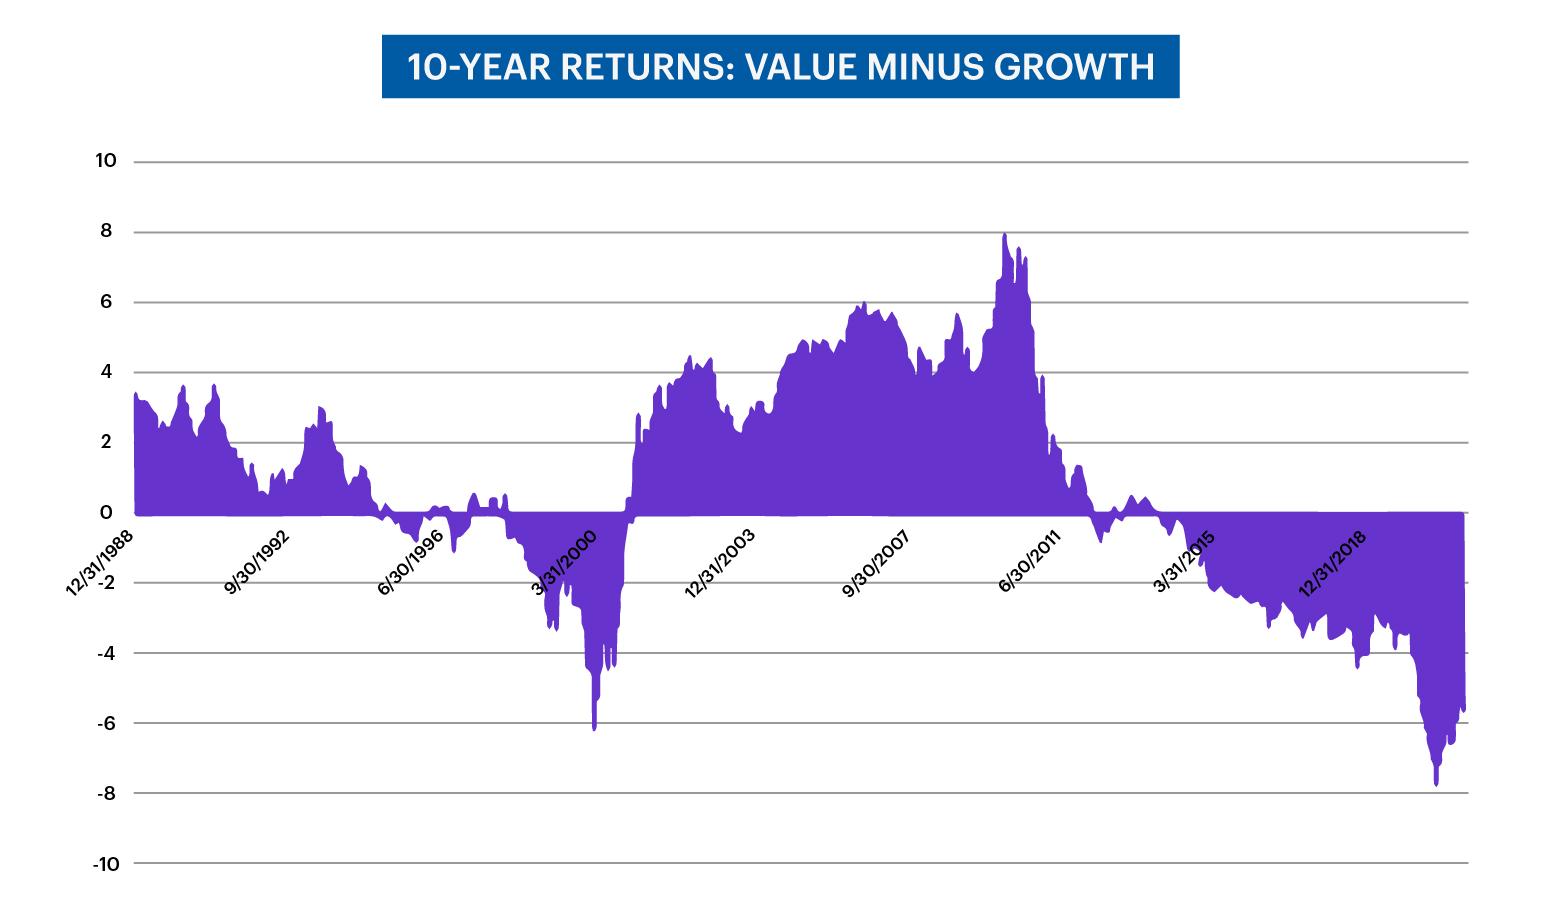 chart - cumulative 10-year returns; value minus growth